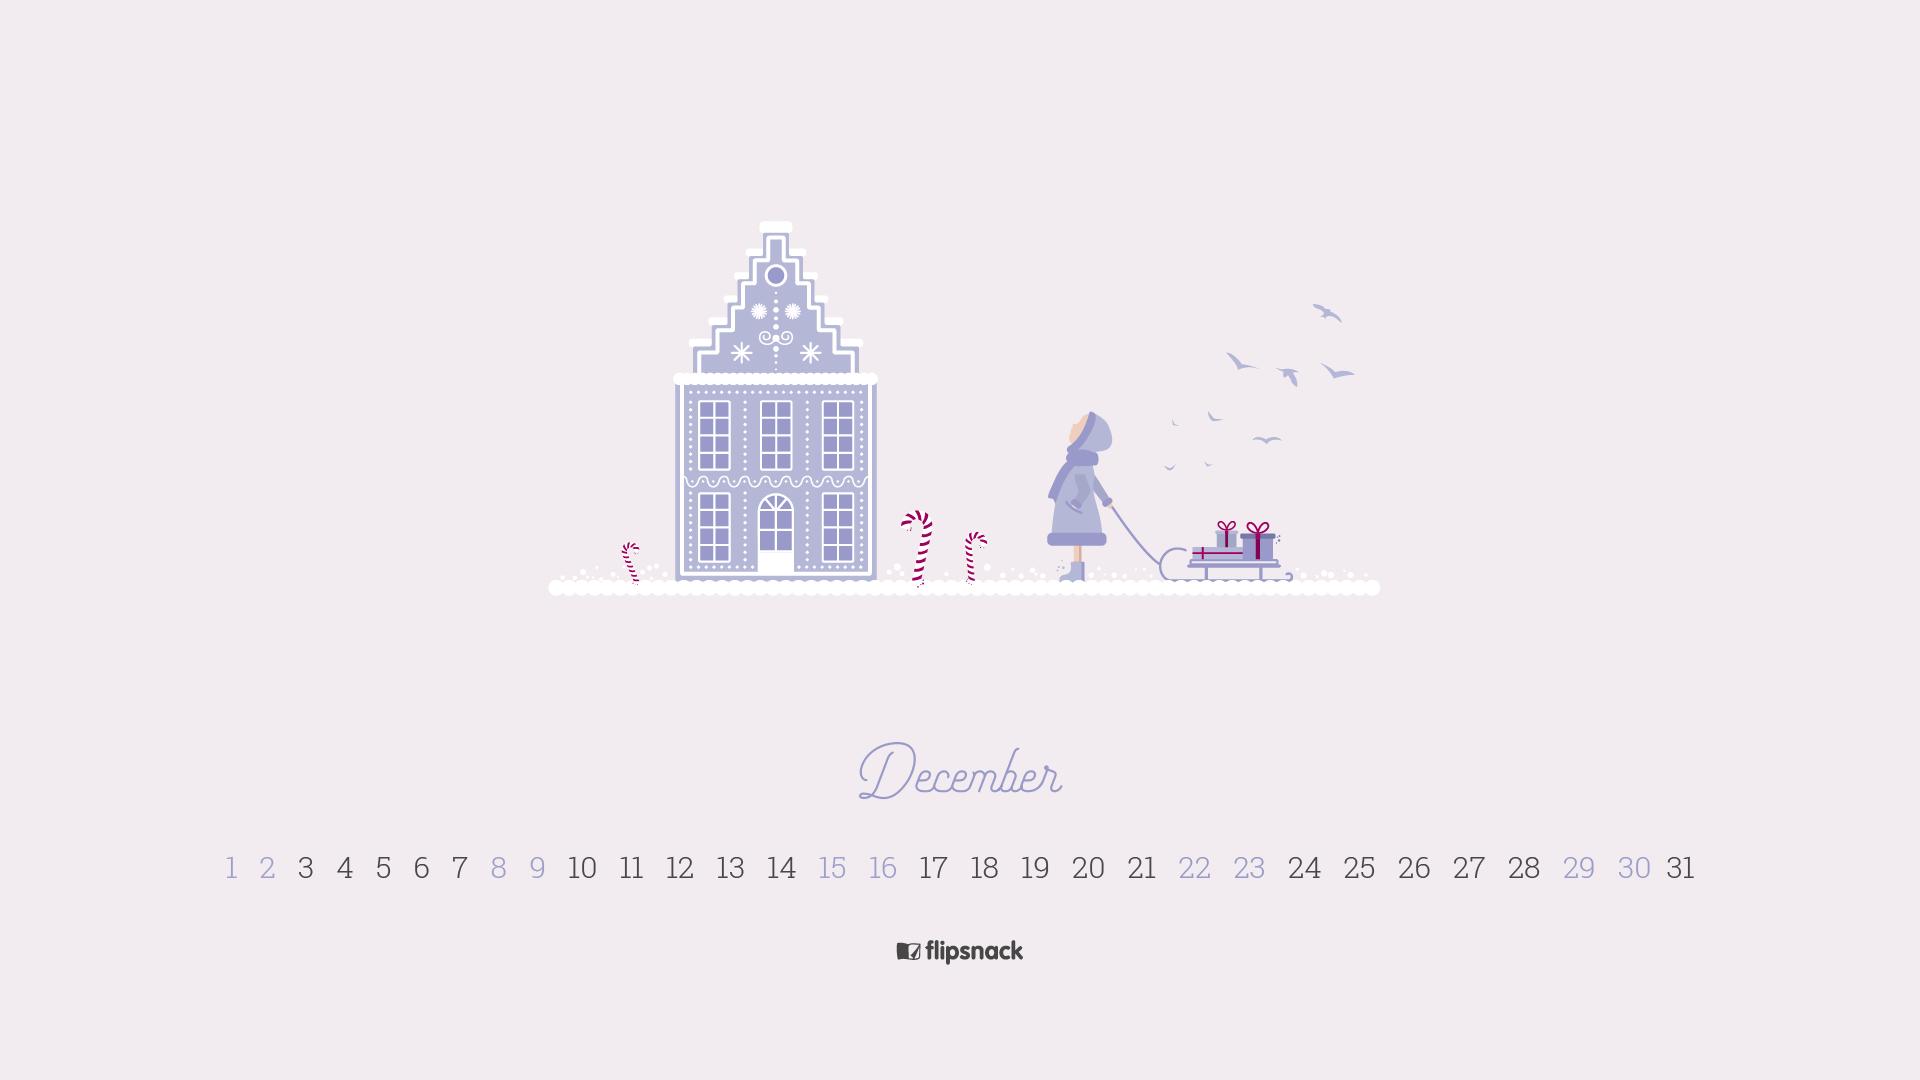 Free December 2018 Wallpaper Calendars Flipsnack Blog